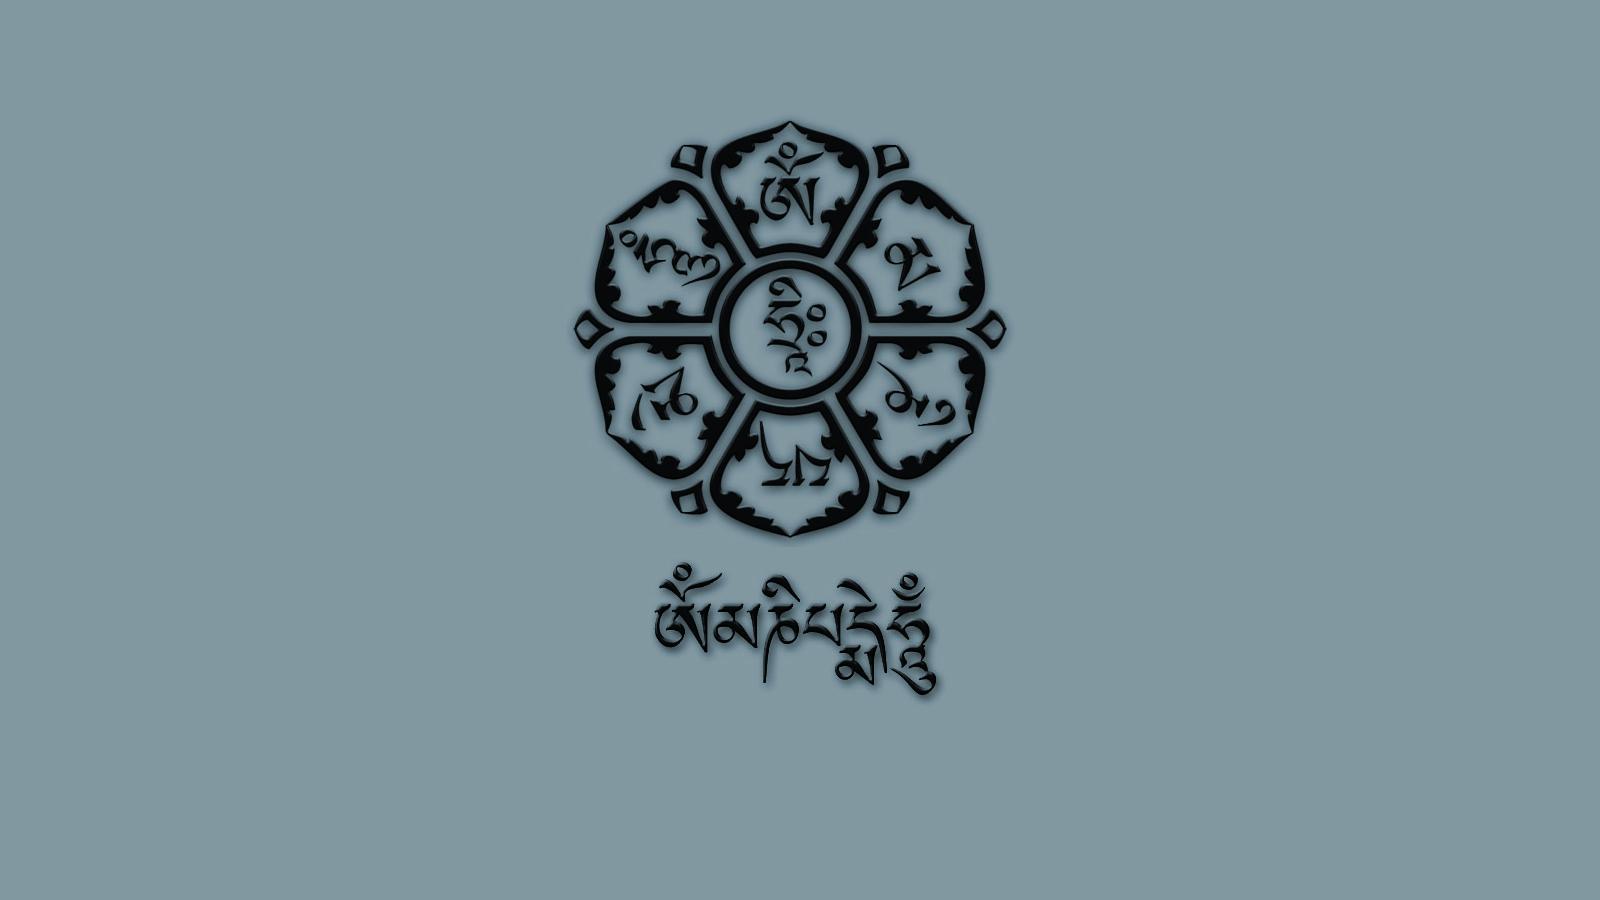 Om Mani Padme Hum Wallpaper 1600900 httpsappboxcoms 1600x900